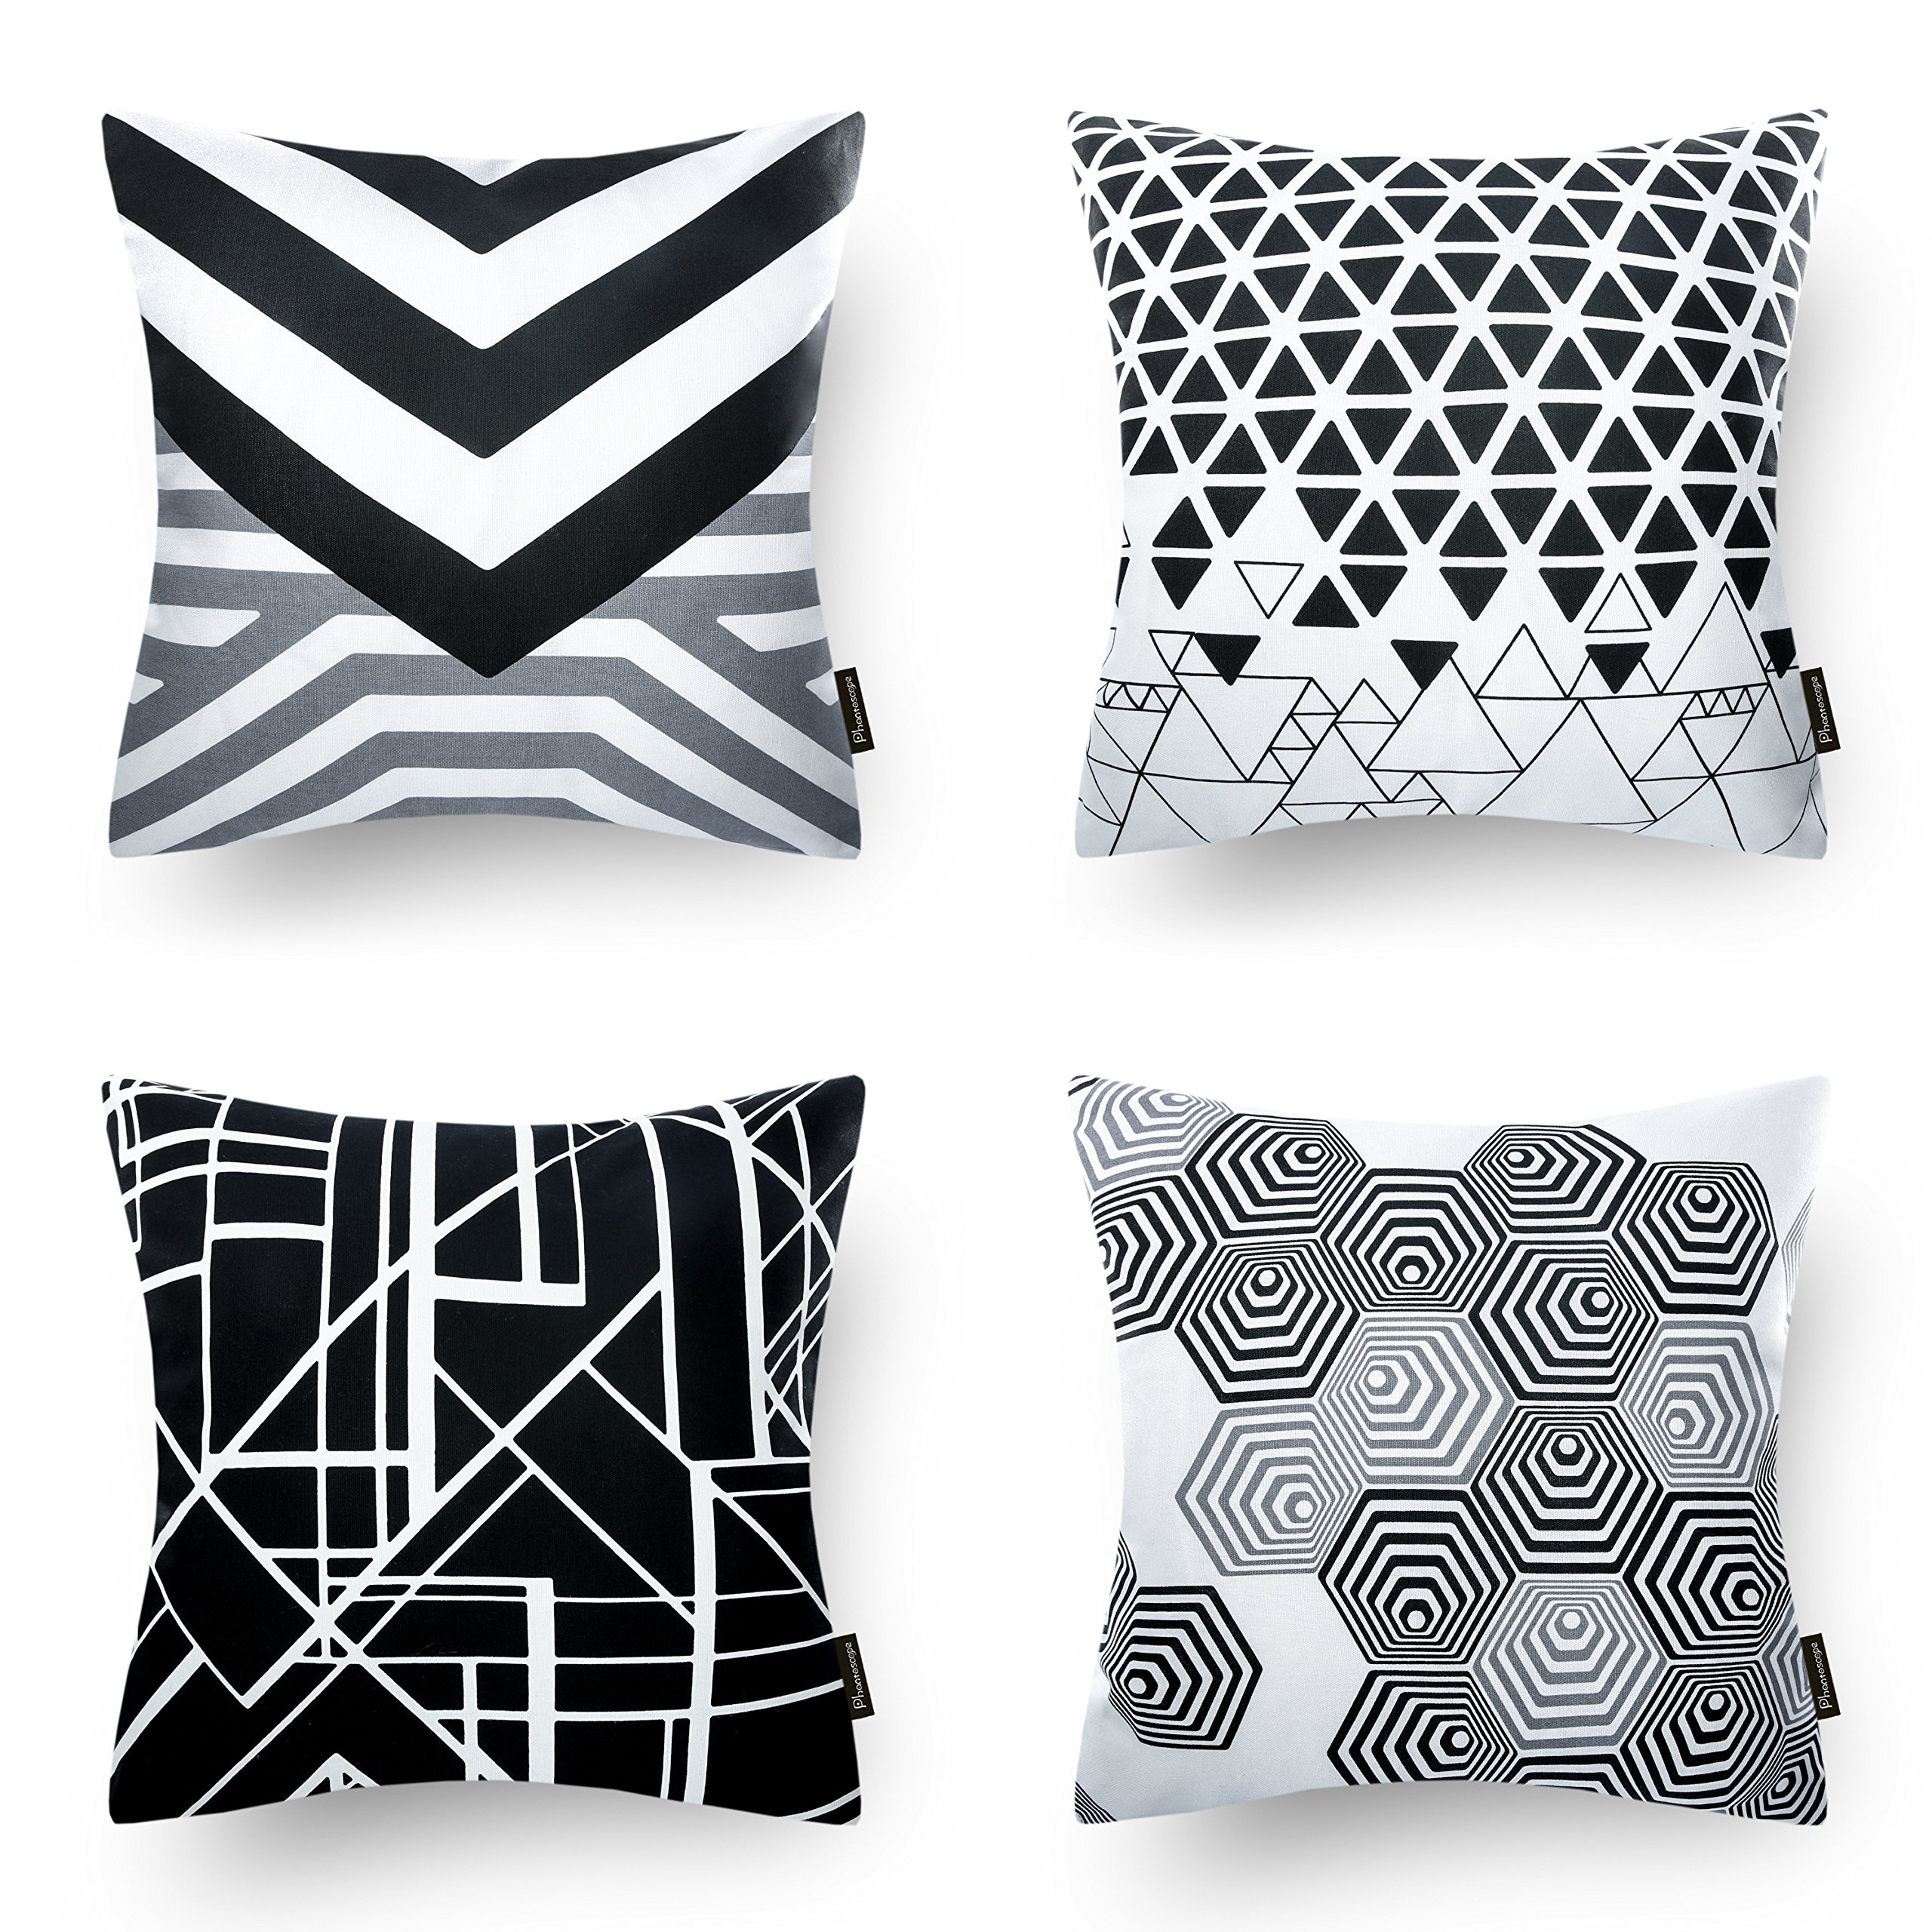 Phantoscope Set Of 4 Black And White Geometric 100 Cotton Throw Pillow Case Cushion Cover 18 X 18 45cm X 45cm Buy Online In Aruba At Aruba Desertcart Com Productid 66906217